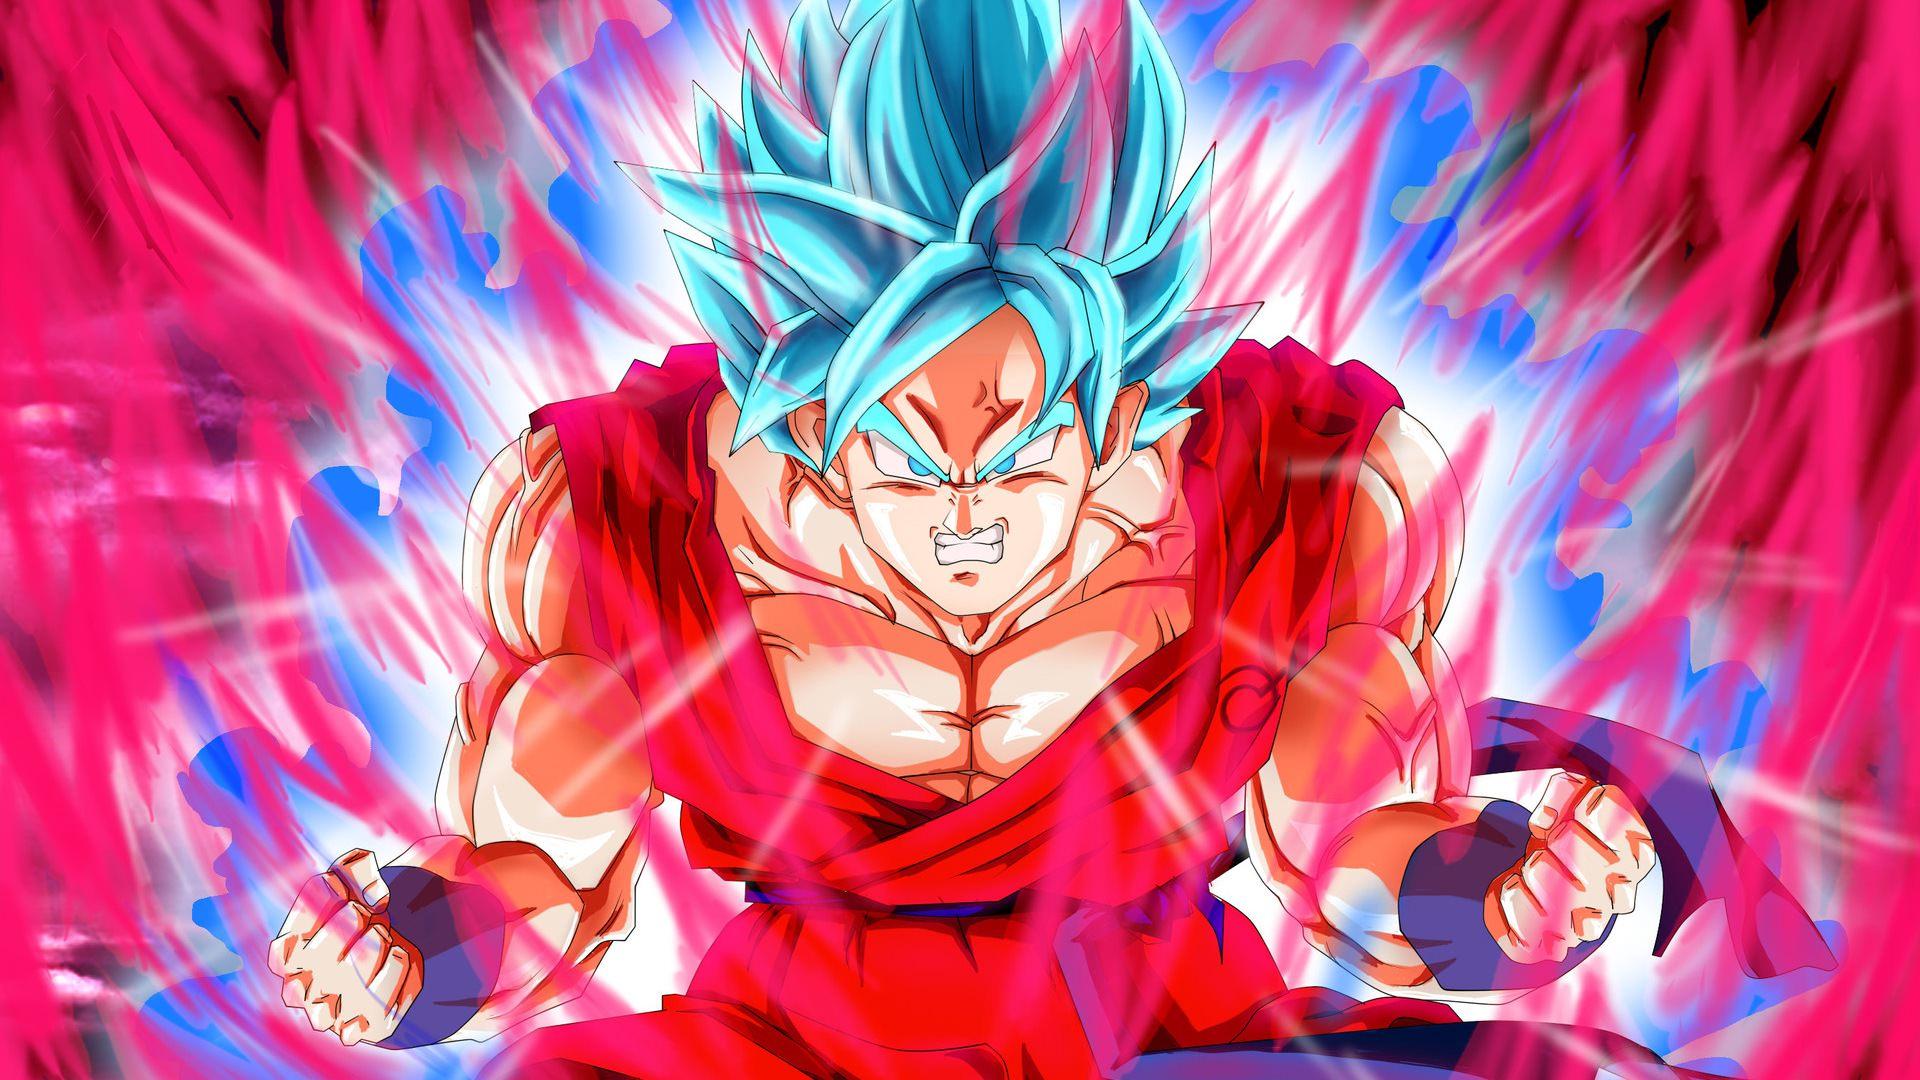 Blue Super Saiyan Goku Wallpapers   Top Blue Super Saiyan 1920x1080